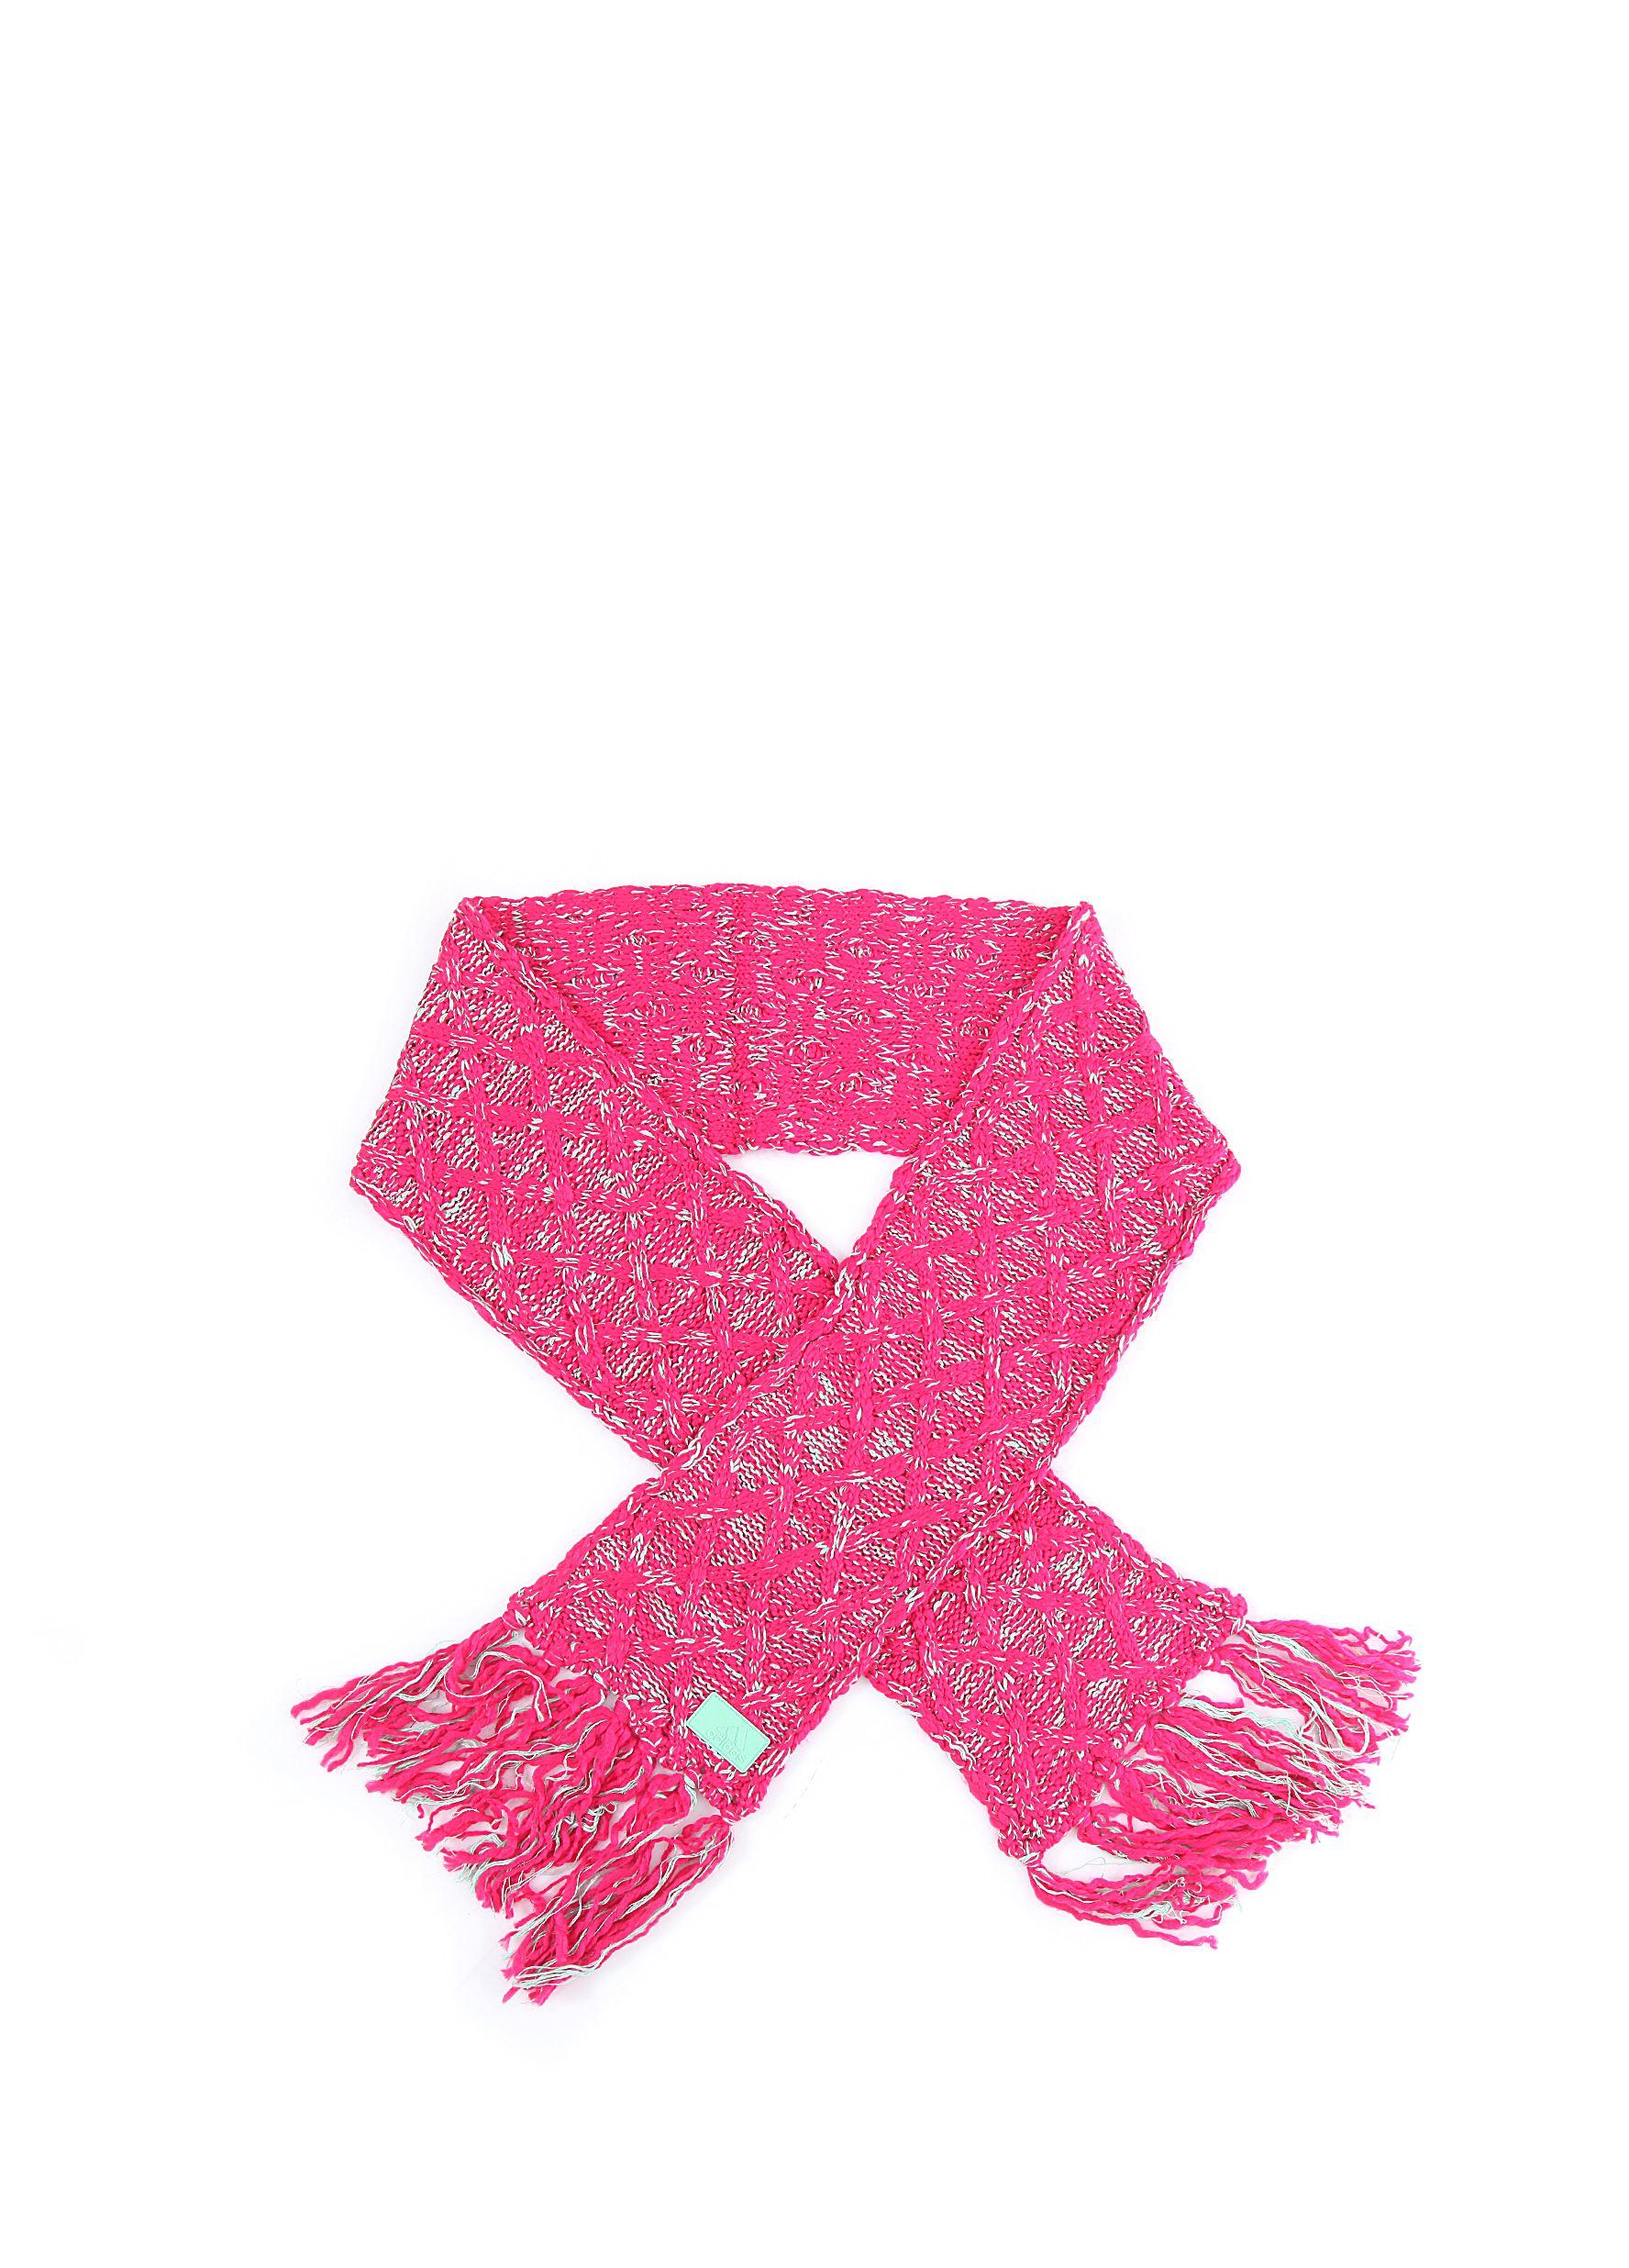 Adidas & Reebok Accessories - Γυναικείο Κασκόλ ADIDAS